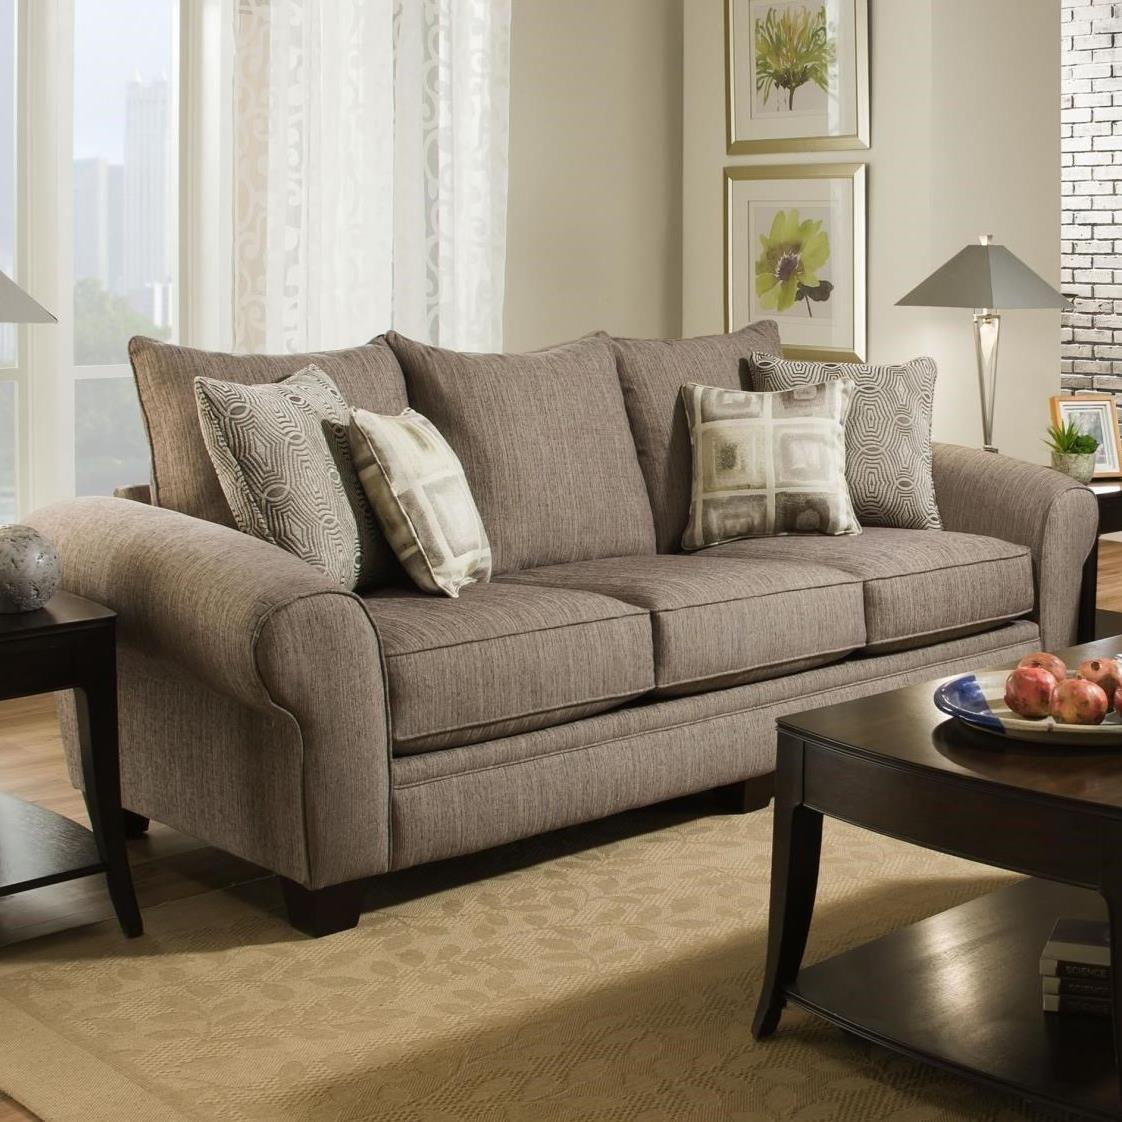 Albany 911 Sofa - Item Number: 0911-00-Essence Pewter